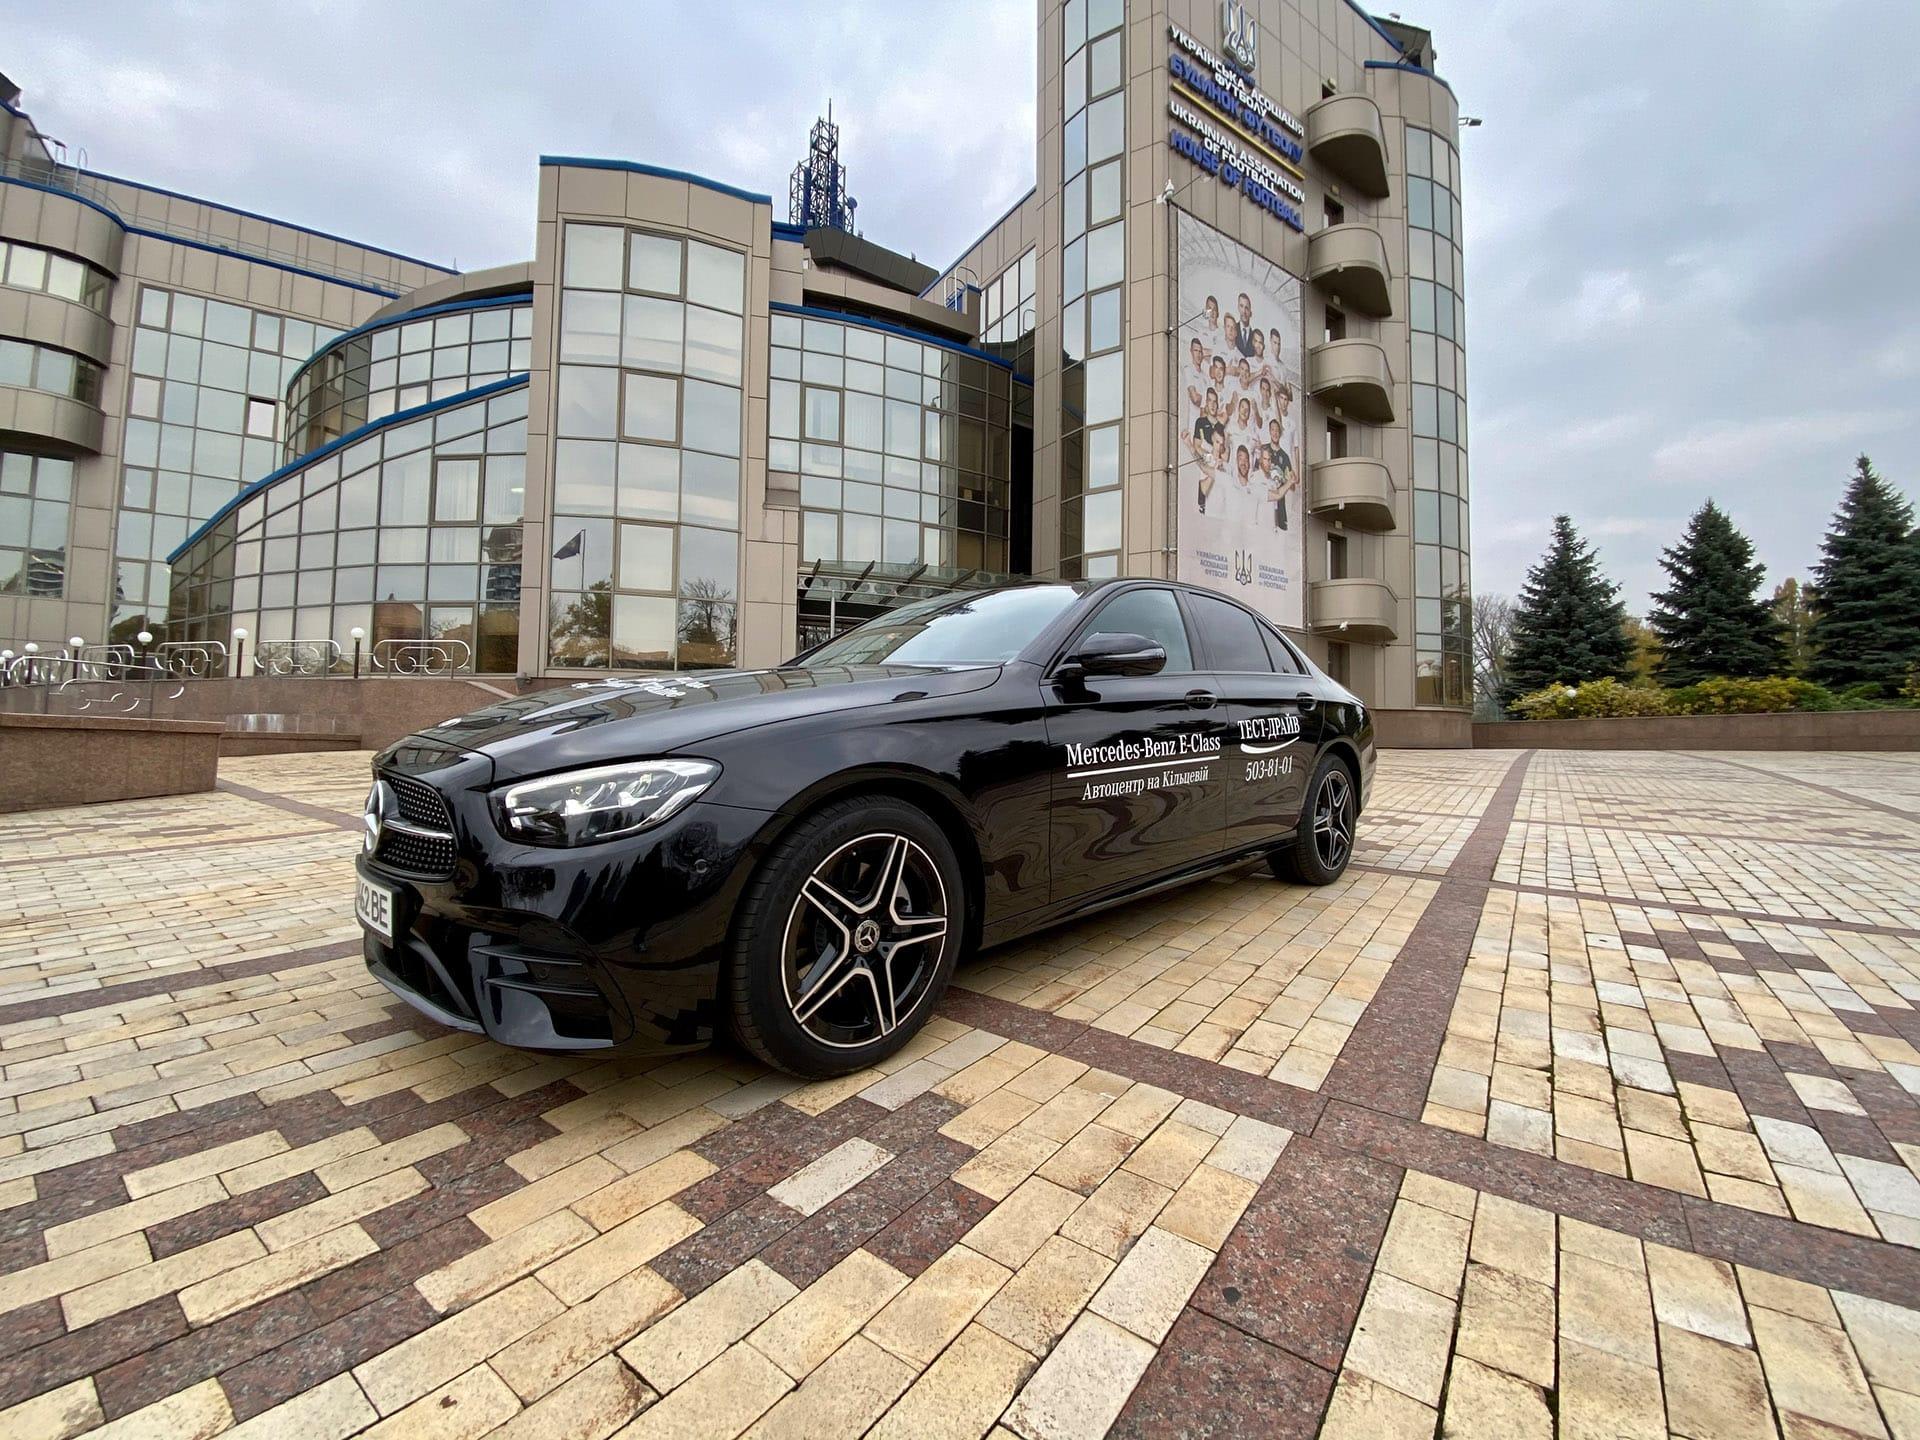 Перший в Україні тест-драйв Mercedes-Benz E-Class 220 d 4MATIC після рестайлінгу